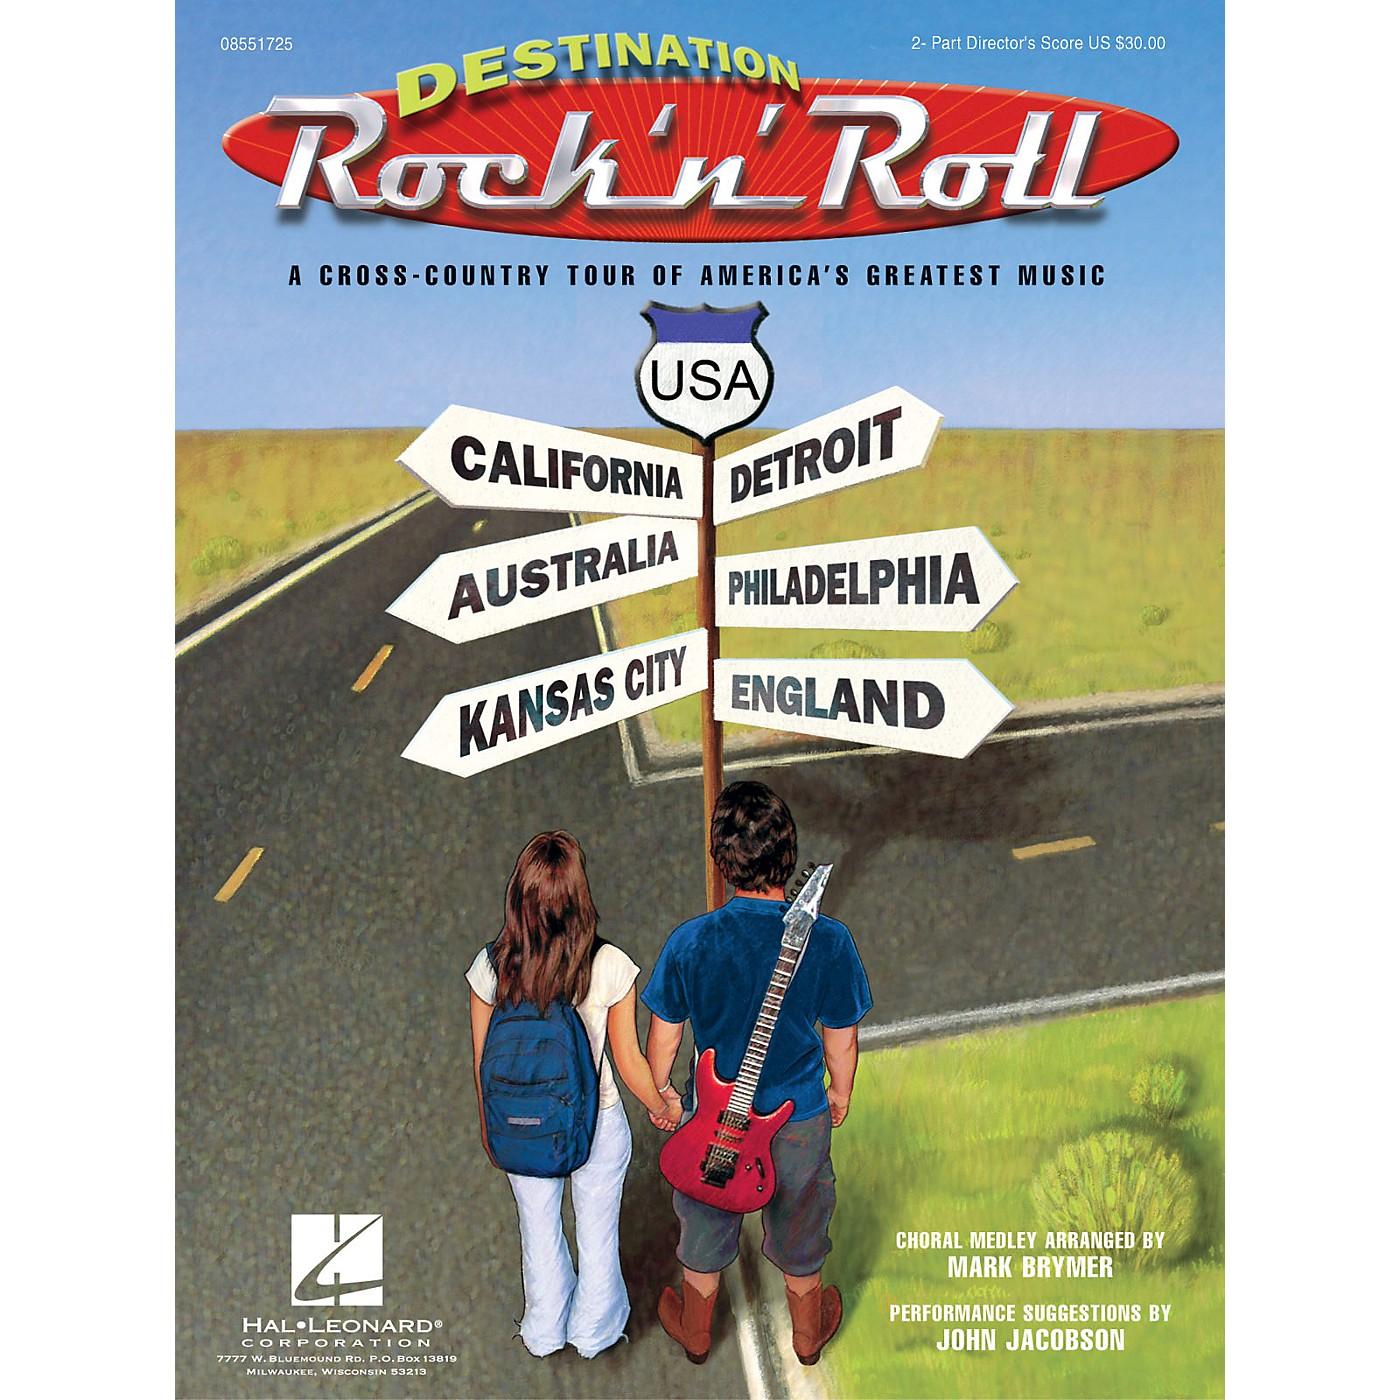 Hal Leonard Destination Rock 'n' Roll (Choral Revue) 2-Part Score arranged by Mark Brymer thumbnail